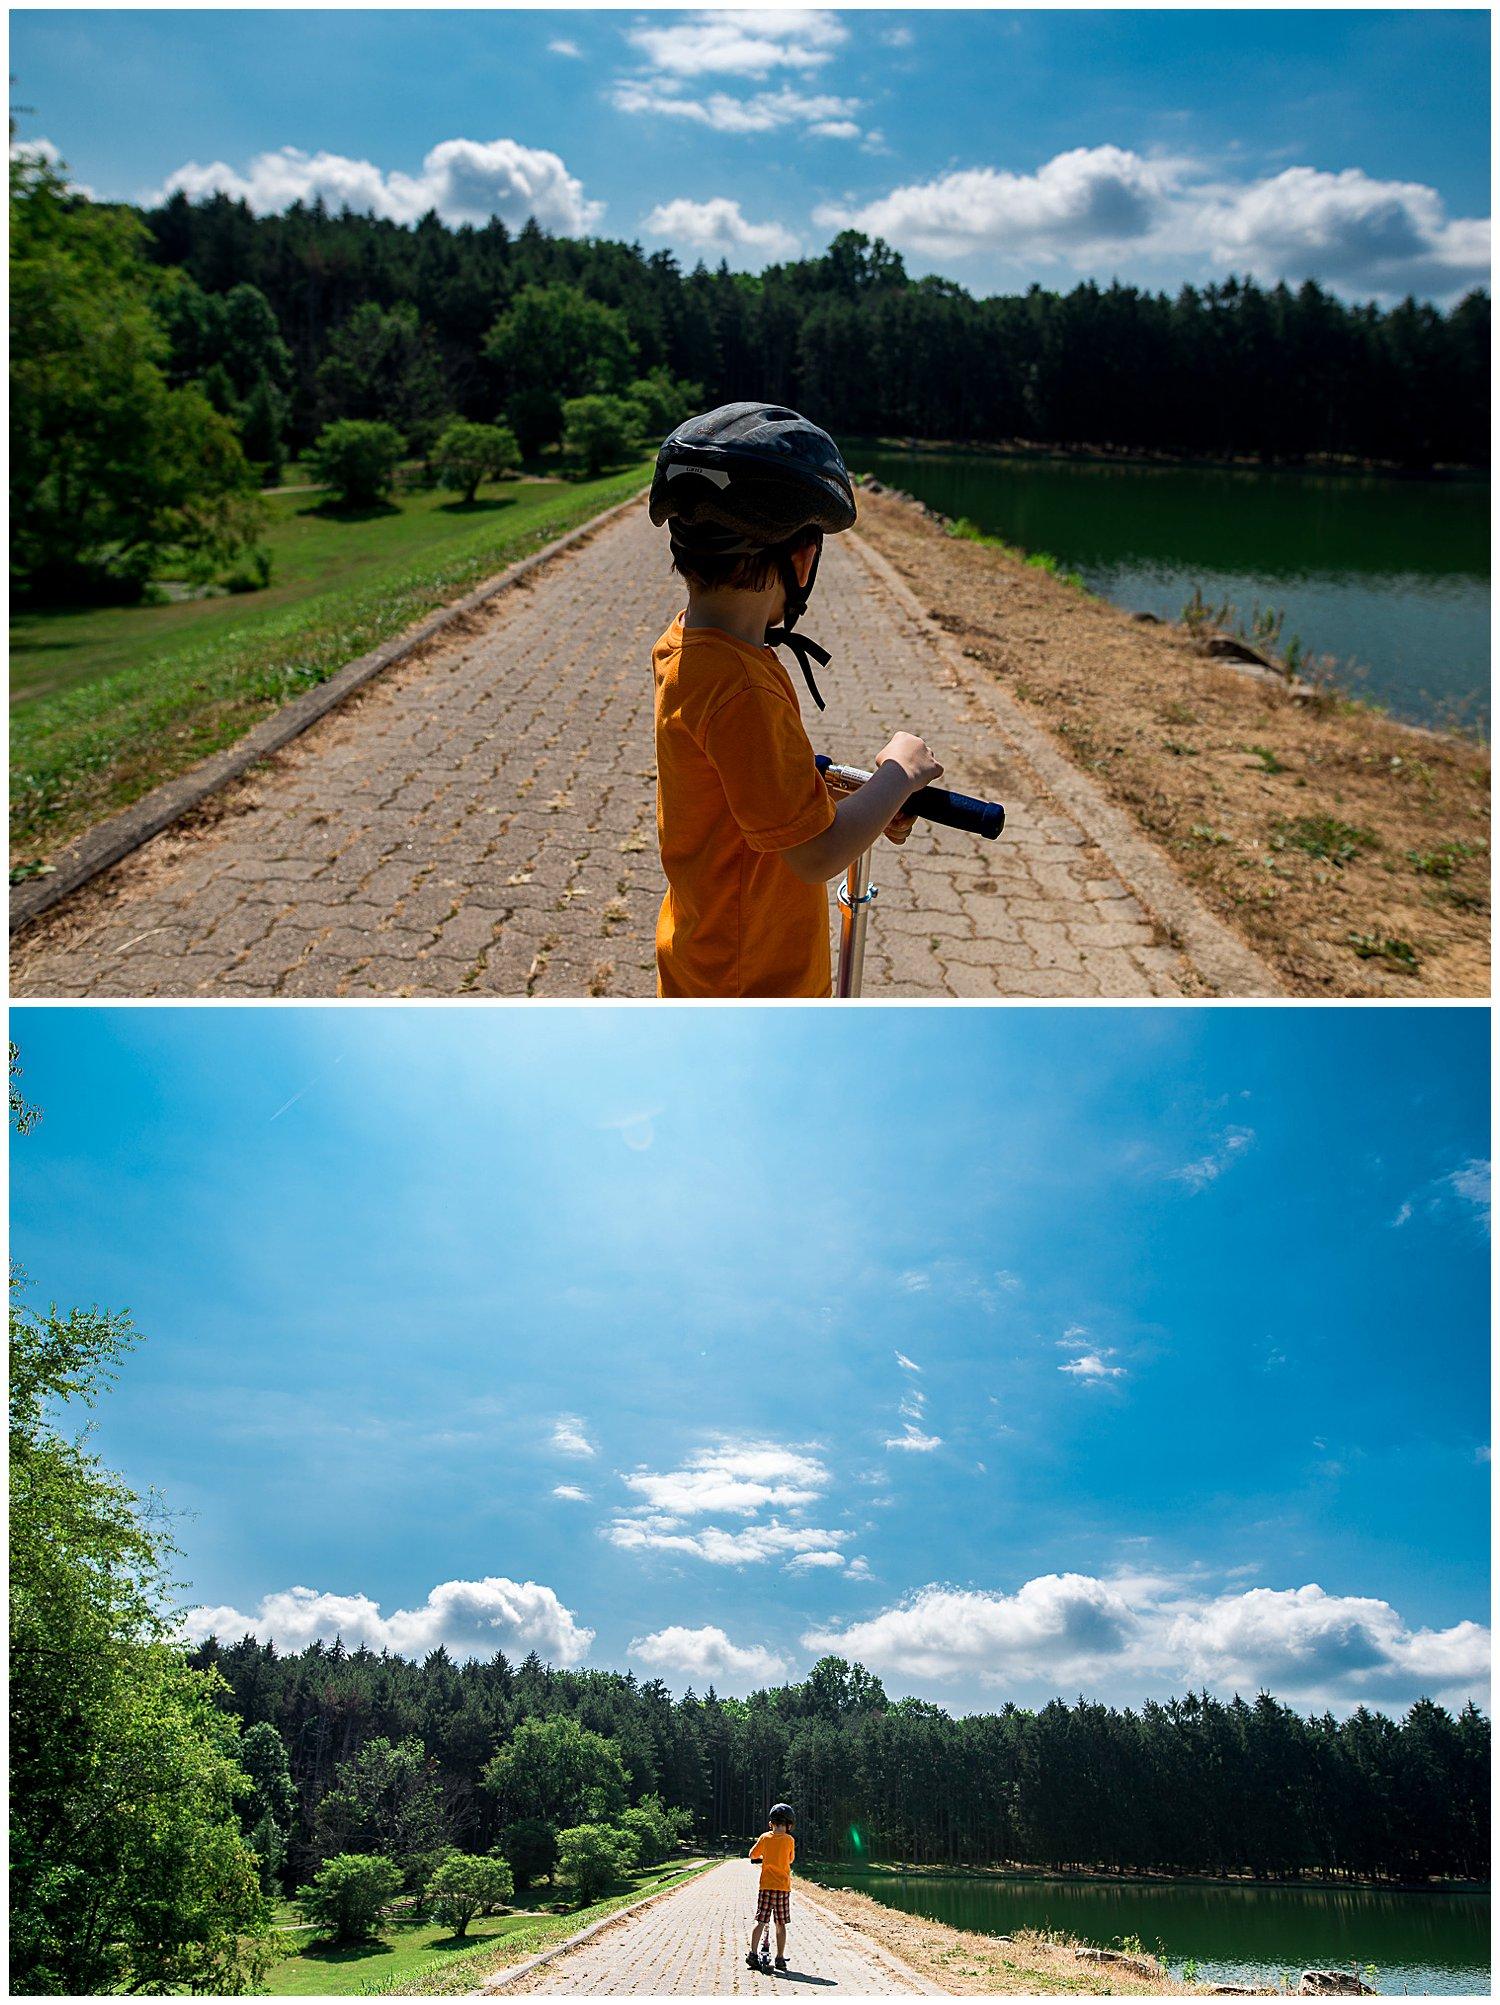 big sky and water at twin lakes park